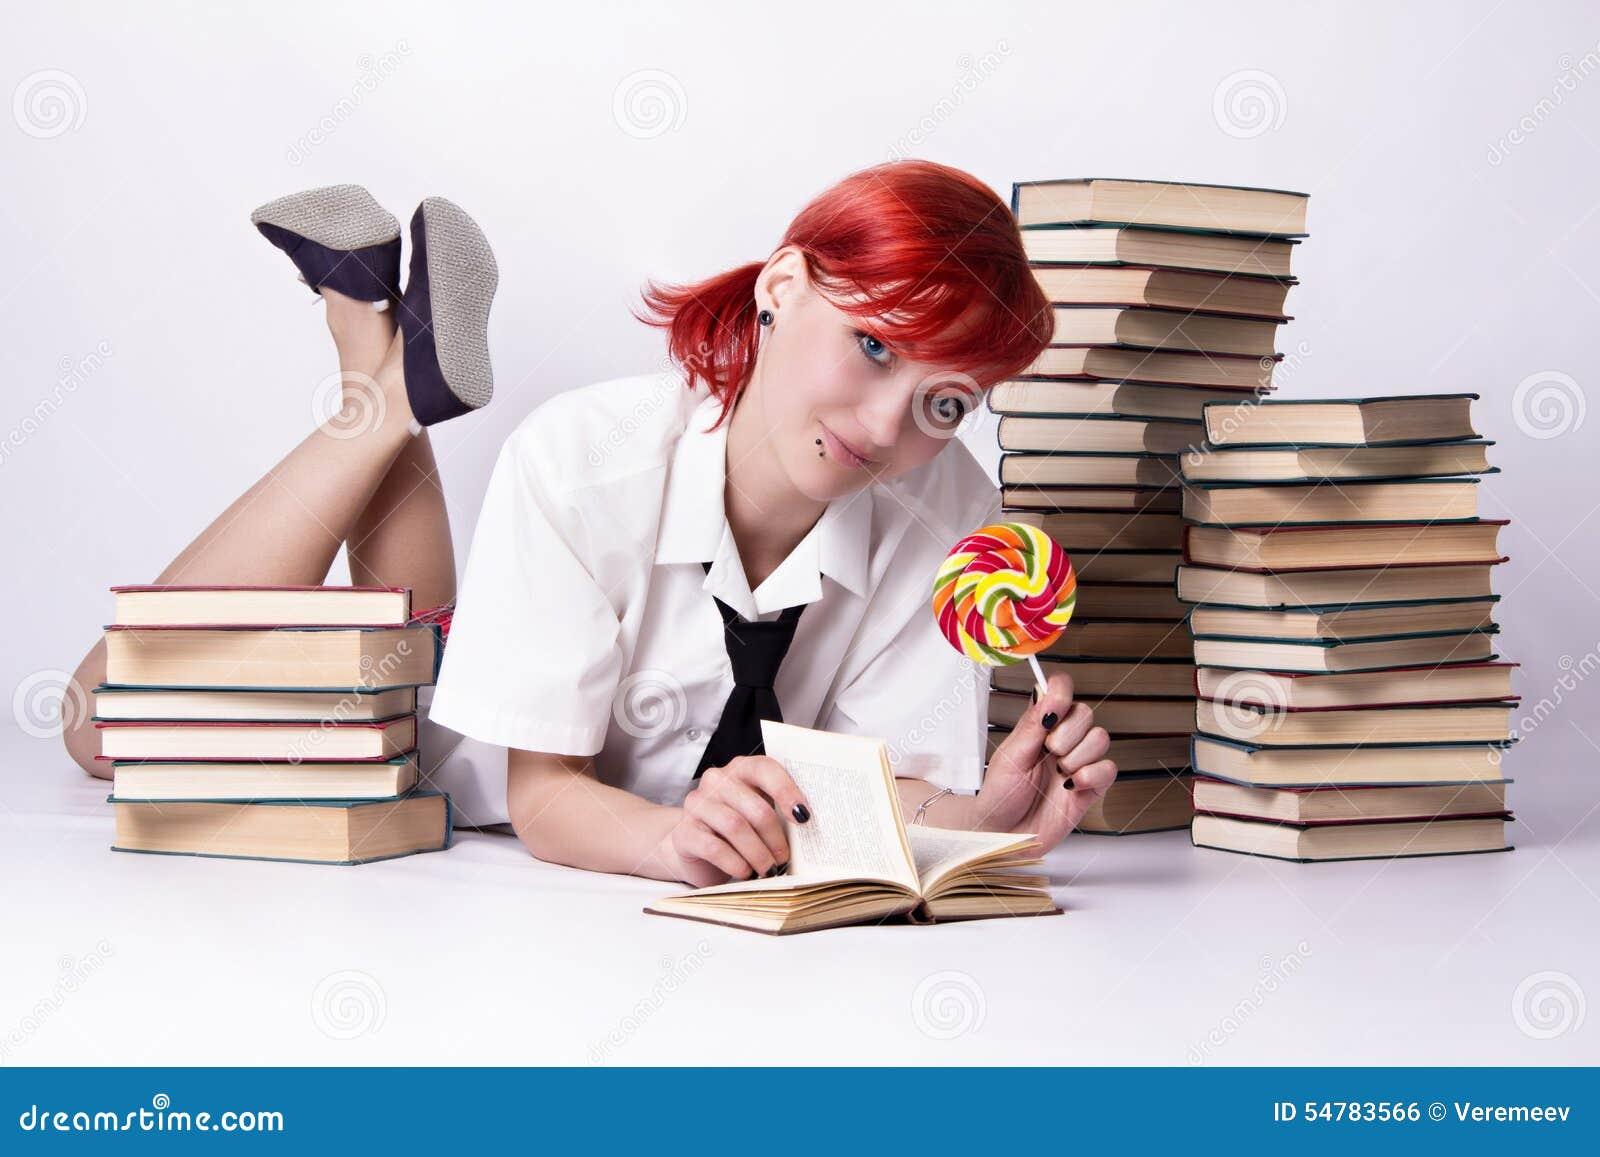 Девушка в стиле аниме с конфетой и книгами